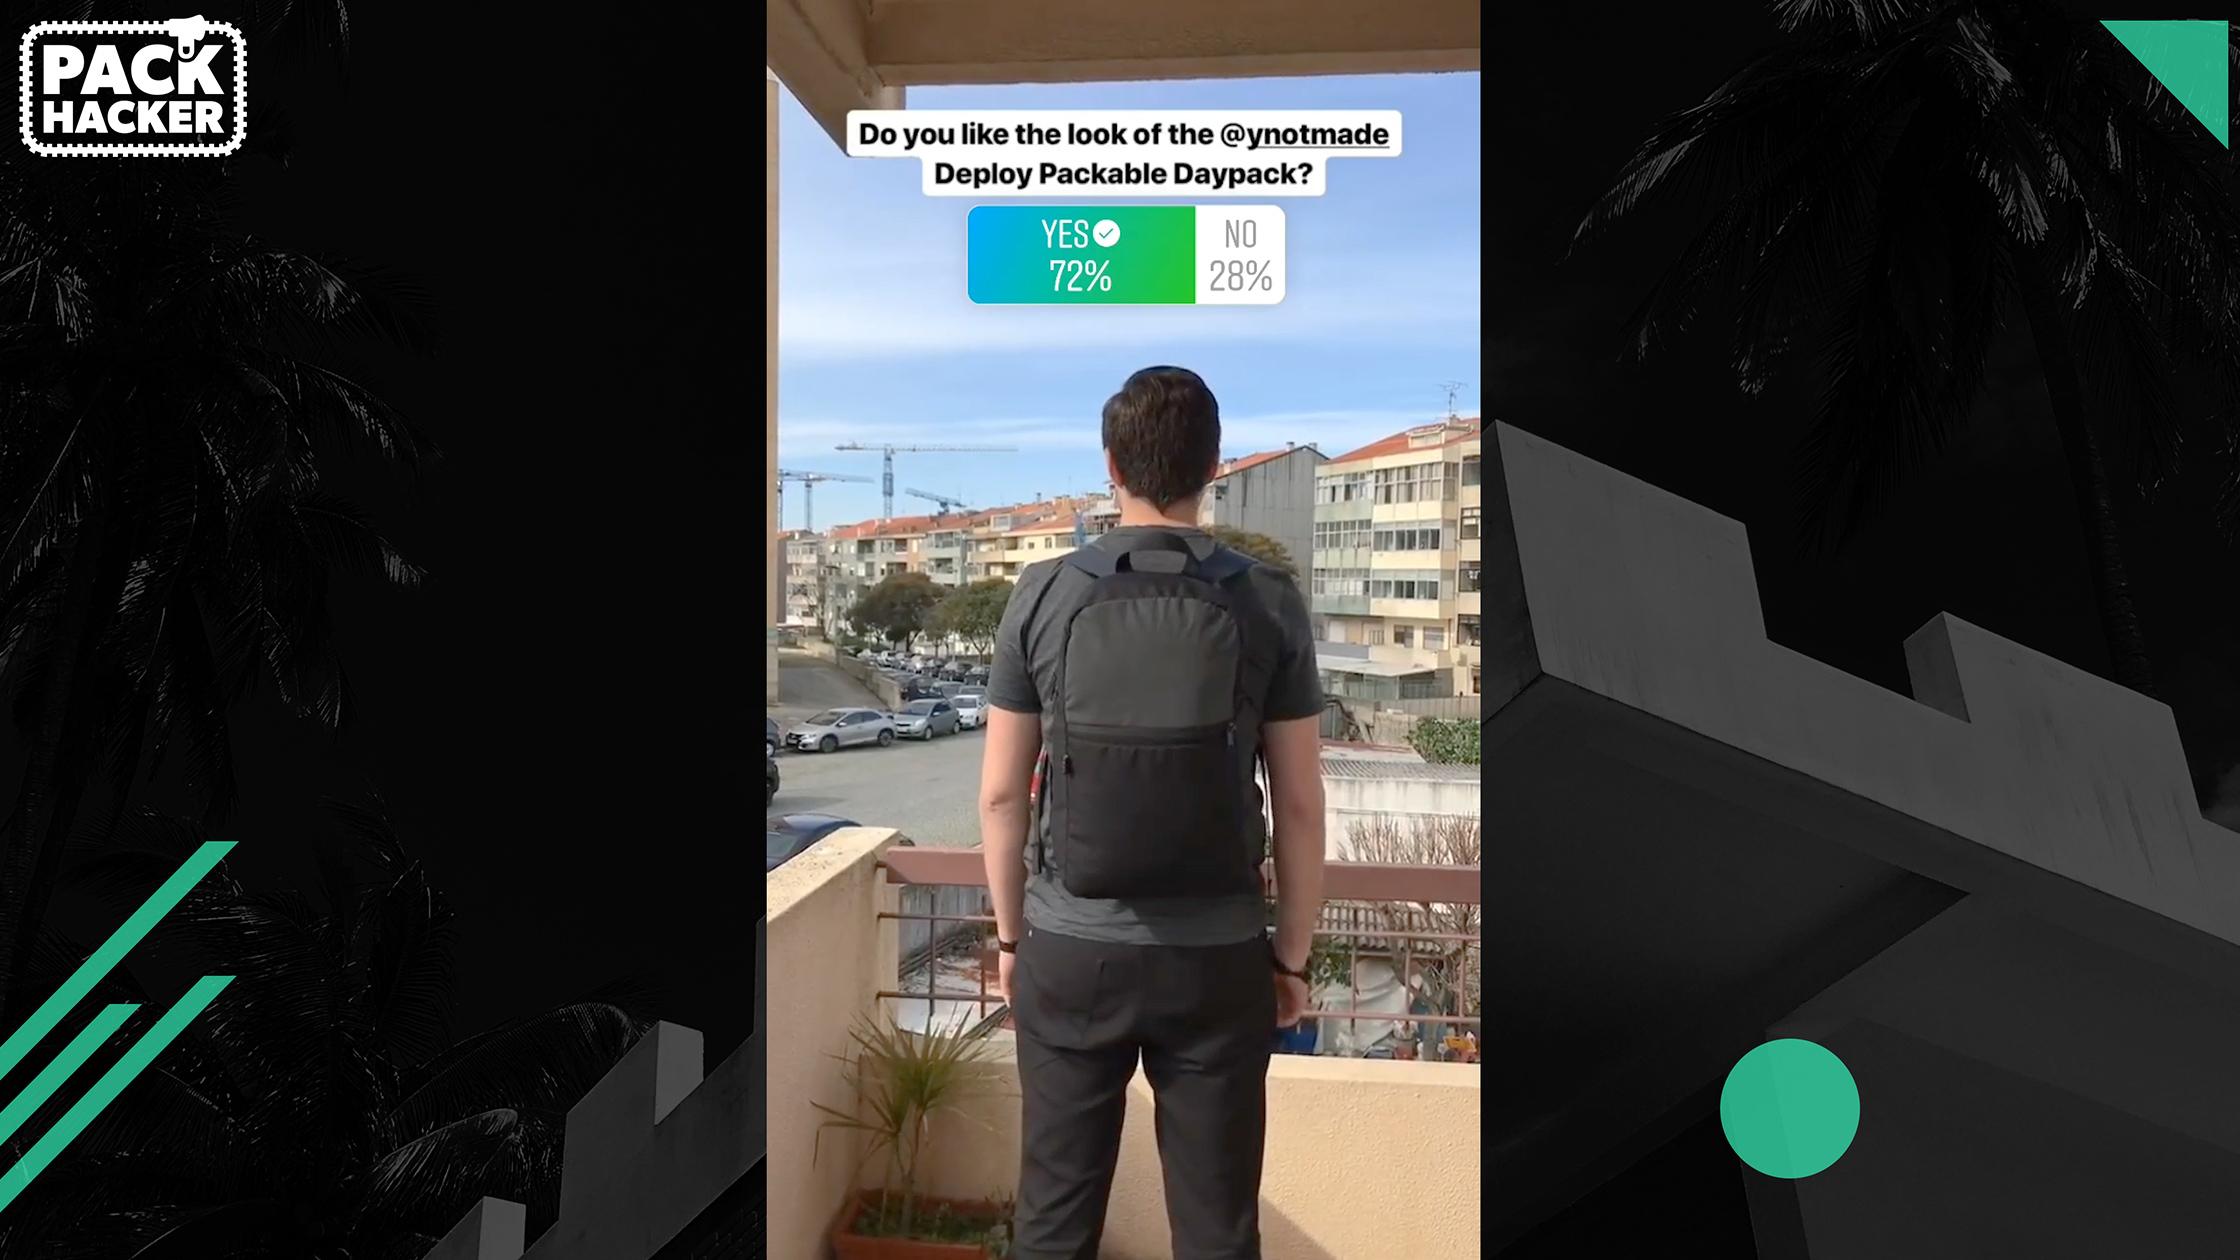 YNOT Deploy Instagram Poll